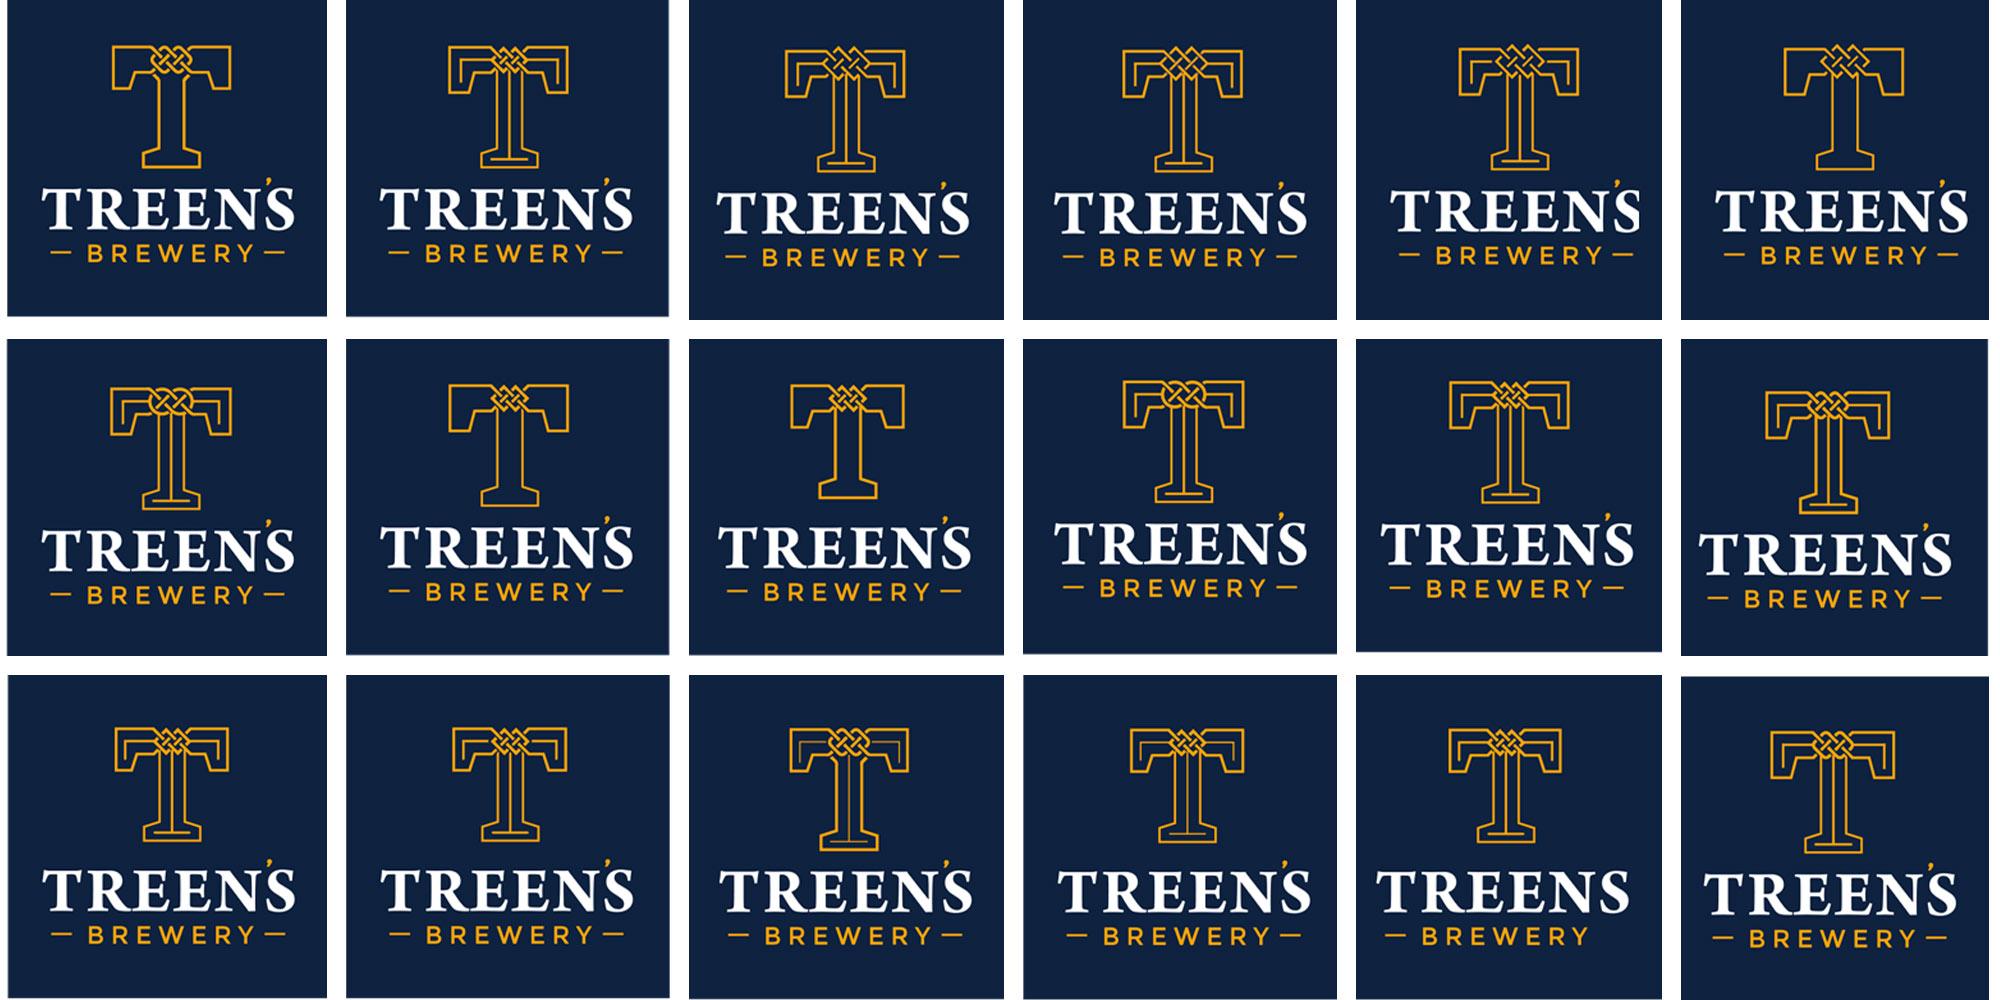 Treen's Brewery Logo Design Amends